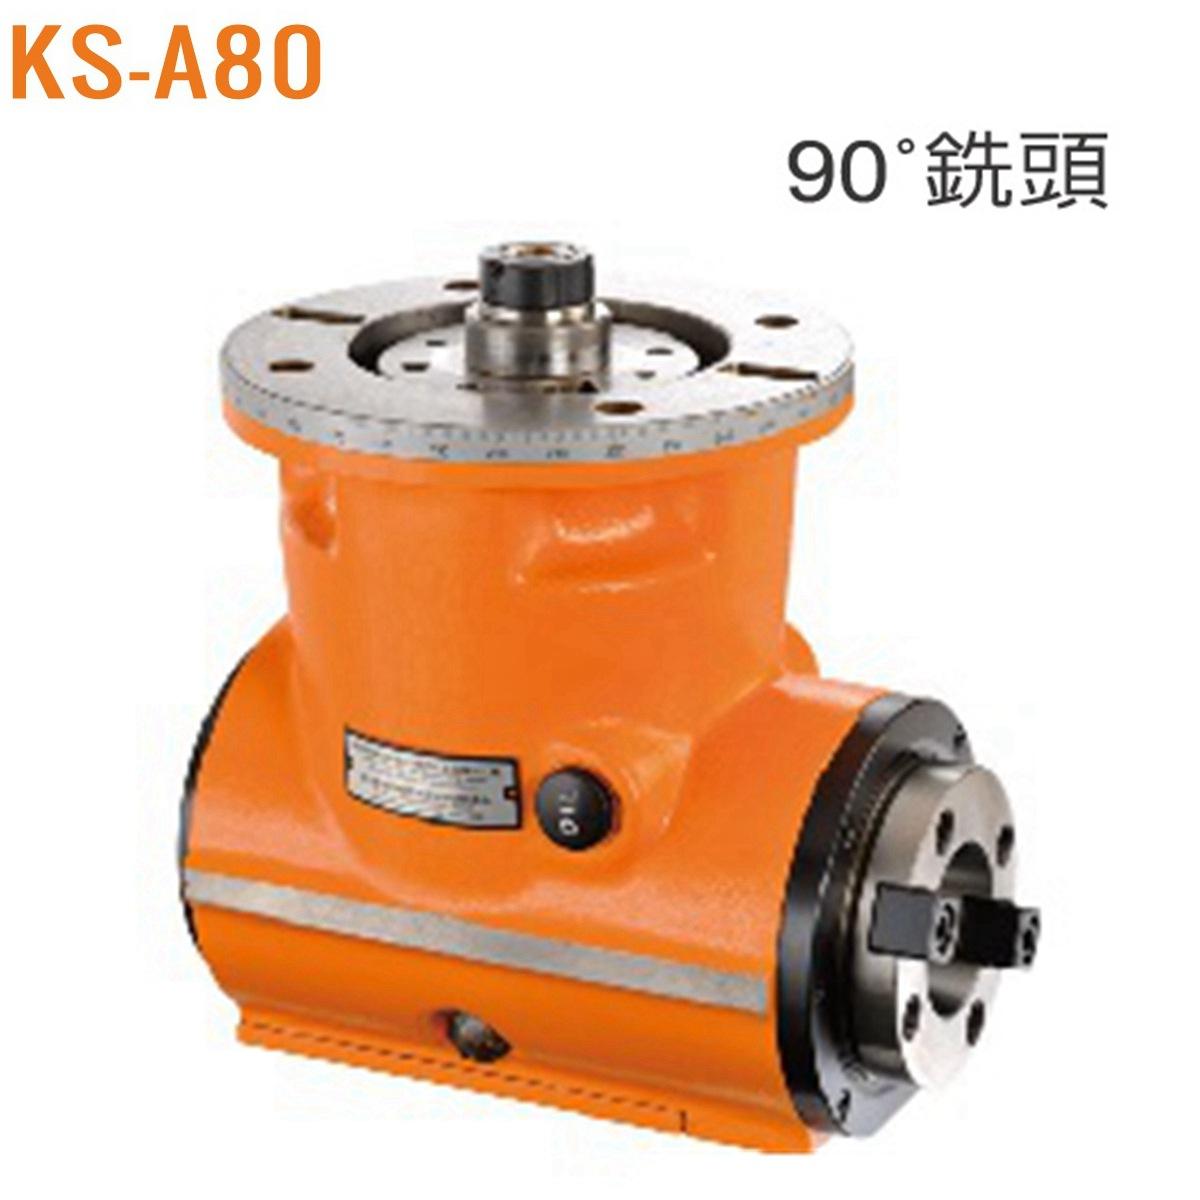 KS-A80图1